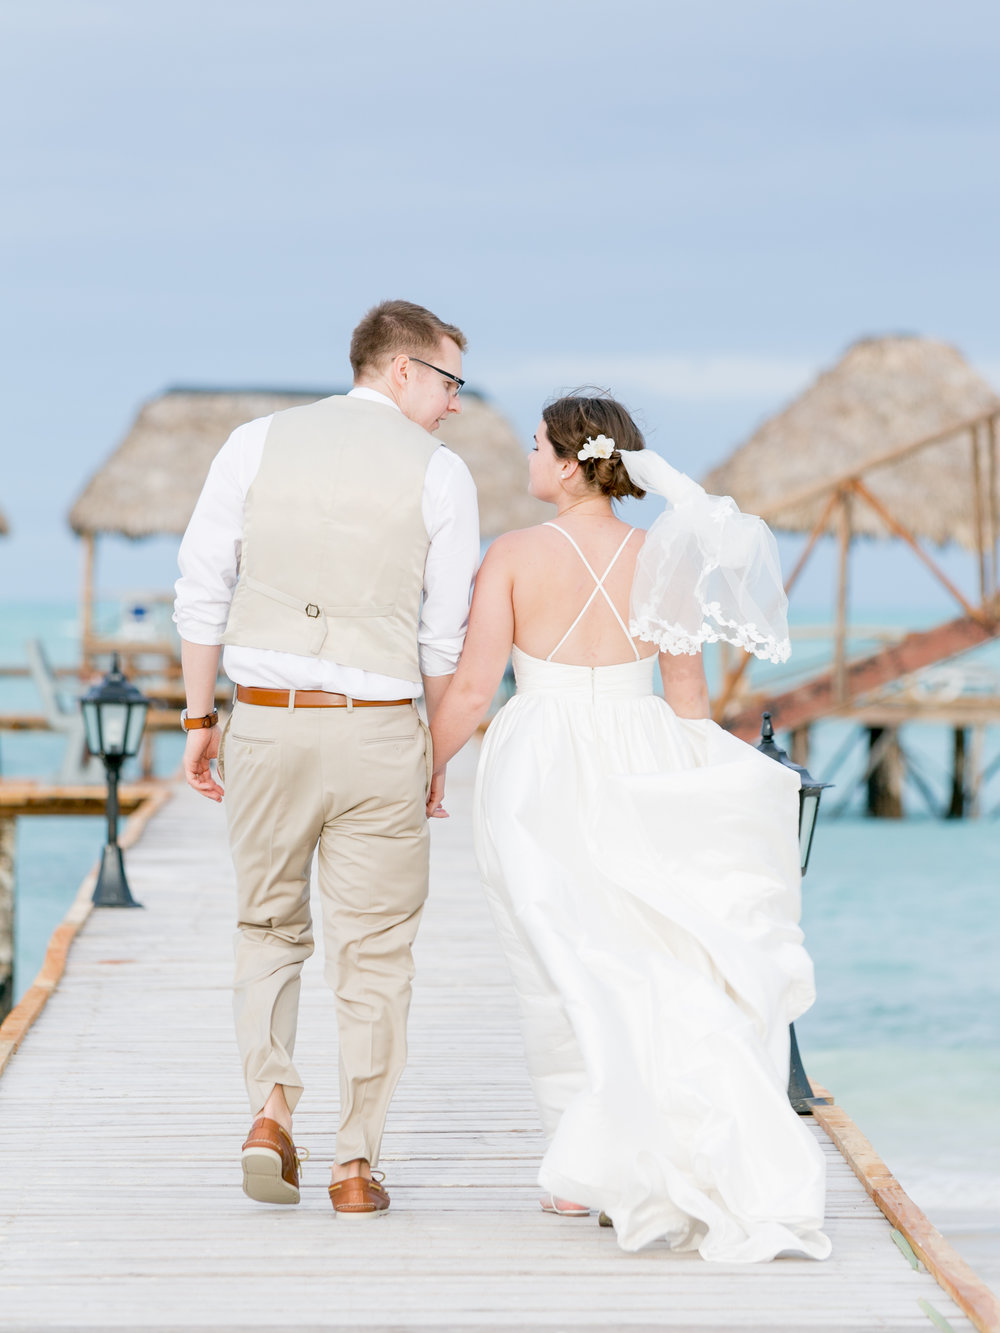 Cayco-Coco-Cuba-Wedding-537.jpg